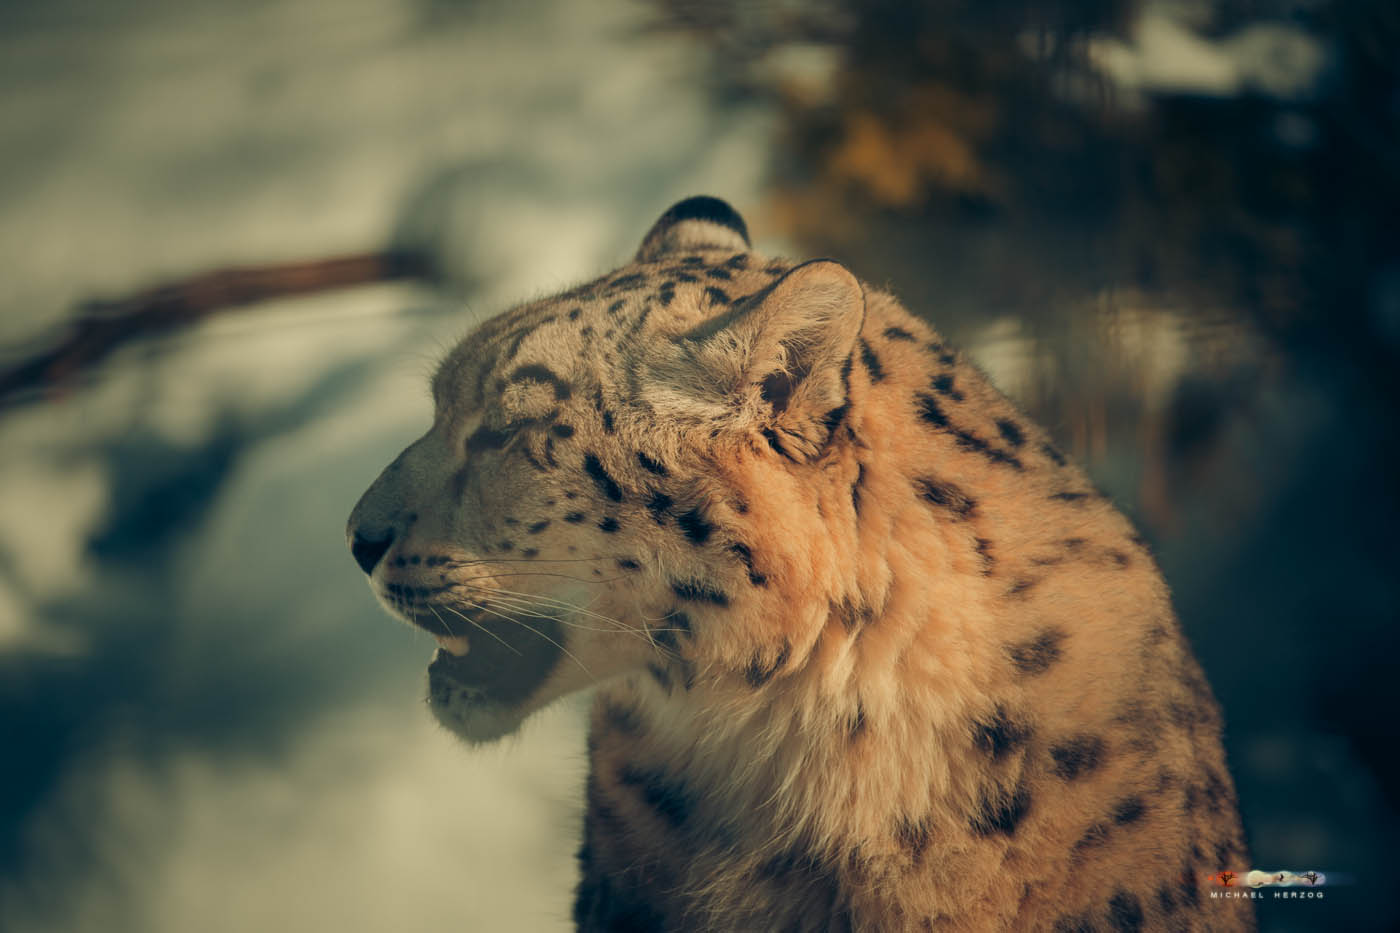 Zoo_Salzburg_MichaelHerzog-7569.jpg